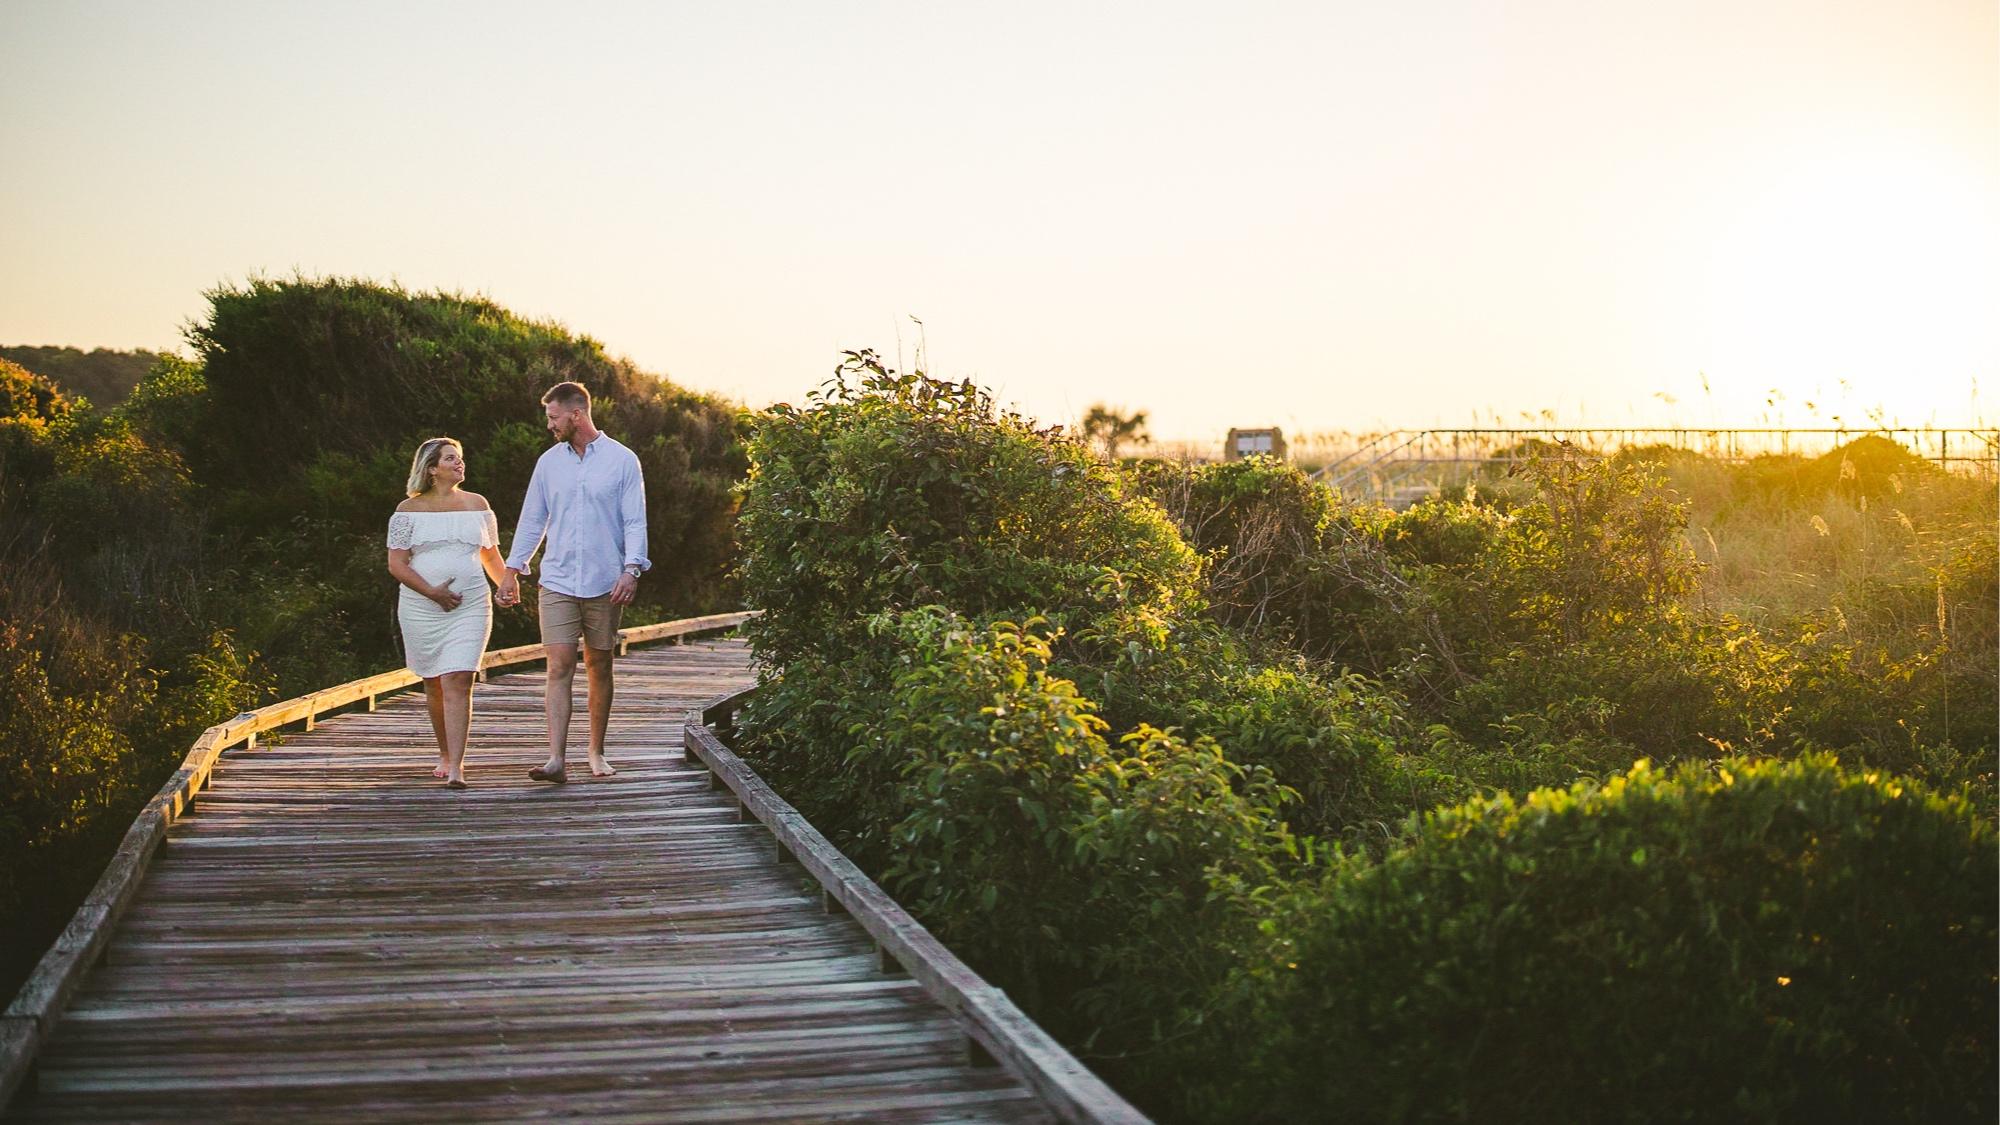 Alyssa & Kelly Maternity Shoot - Myrtle Beach State Park, SC